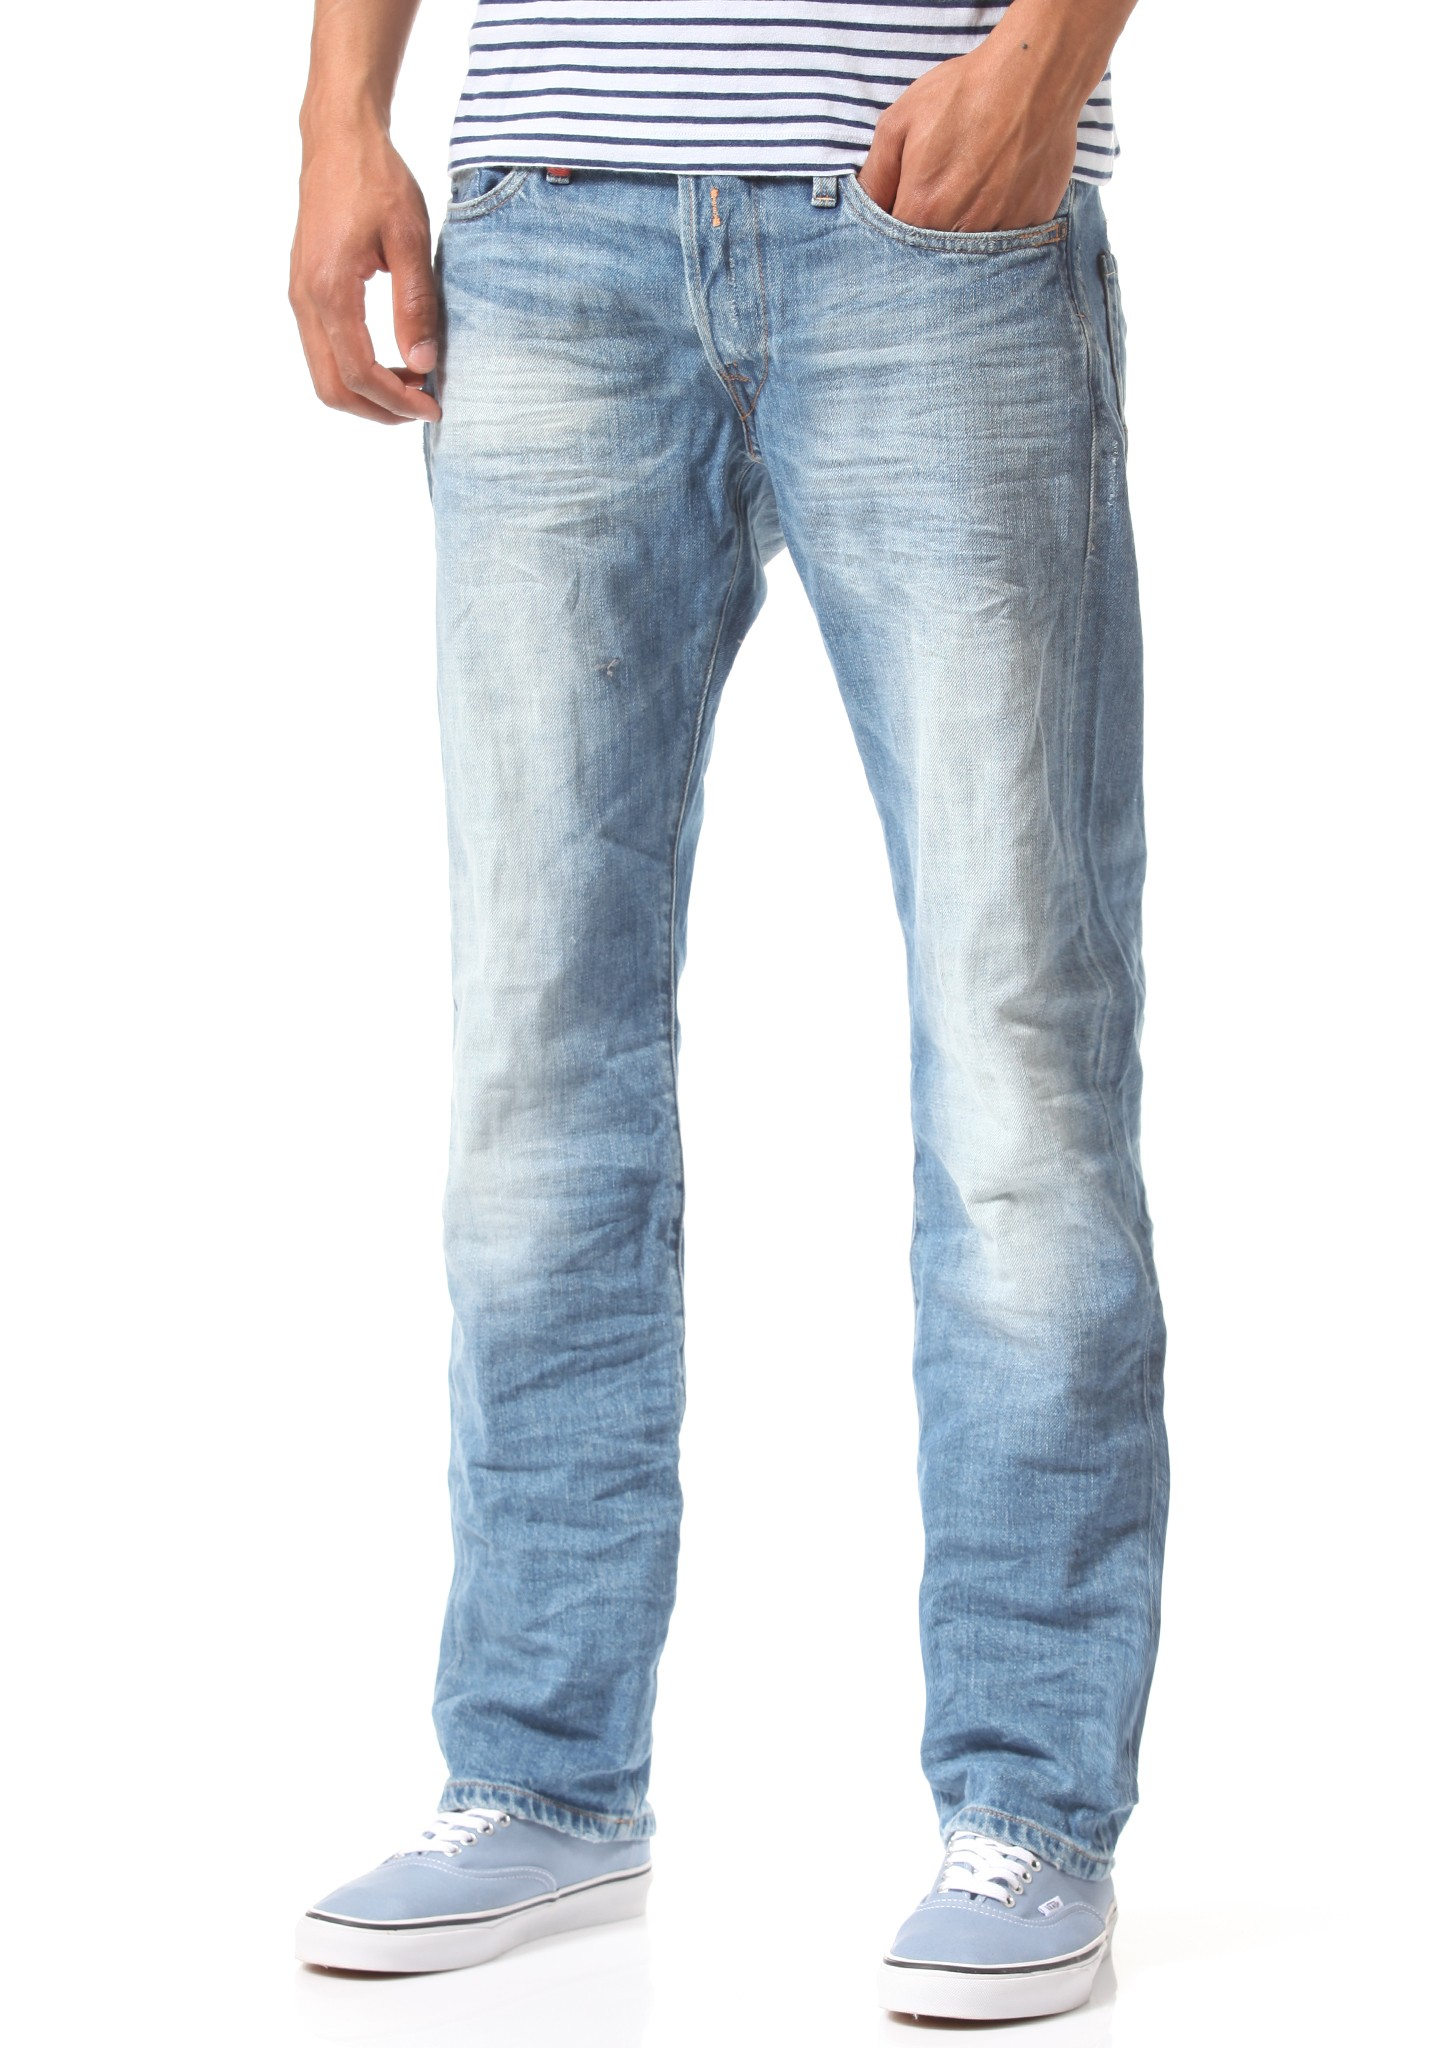 neu replay waitom herren jeans hose ebay. Black Bedroom Furniture Sets. Home Design Ideas